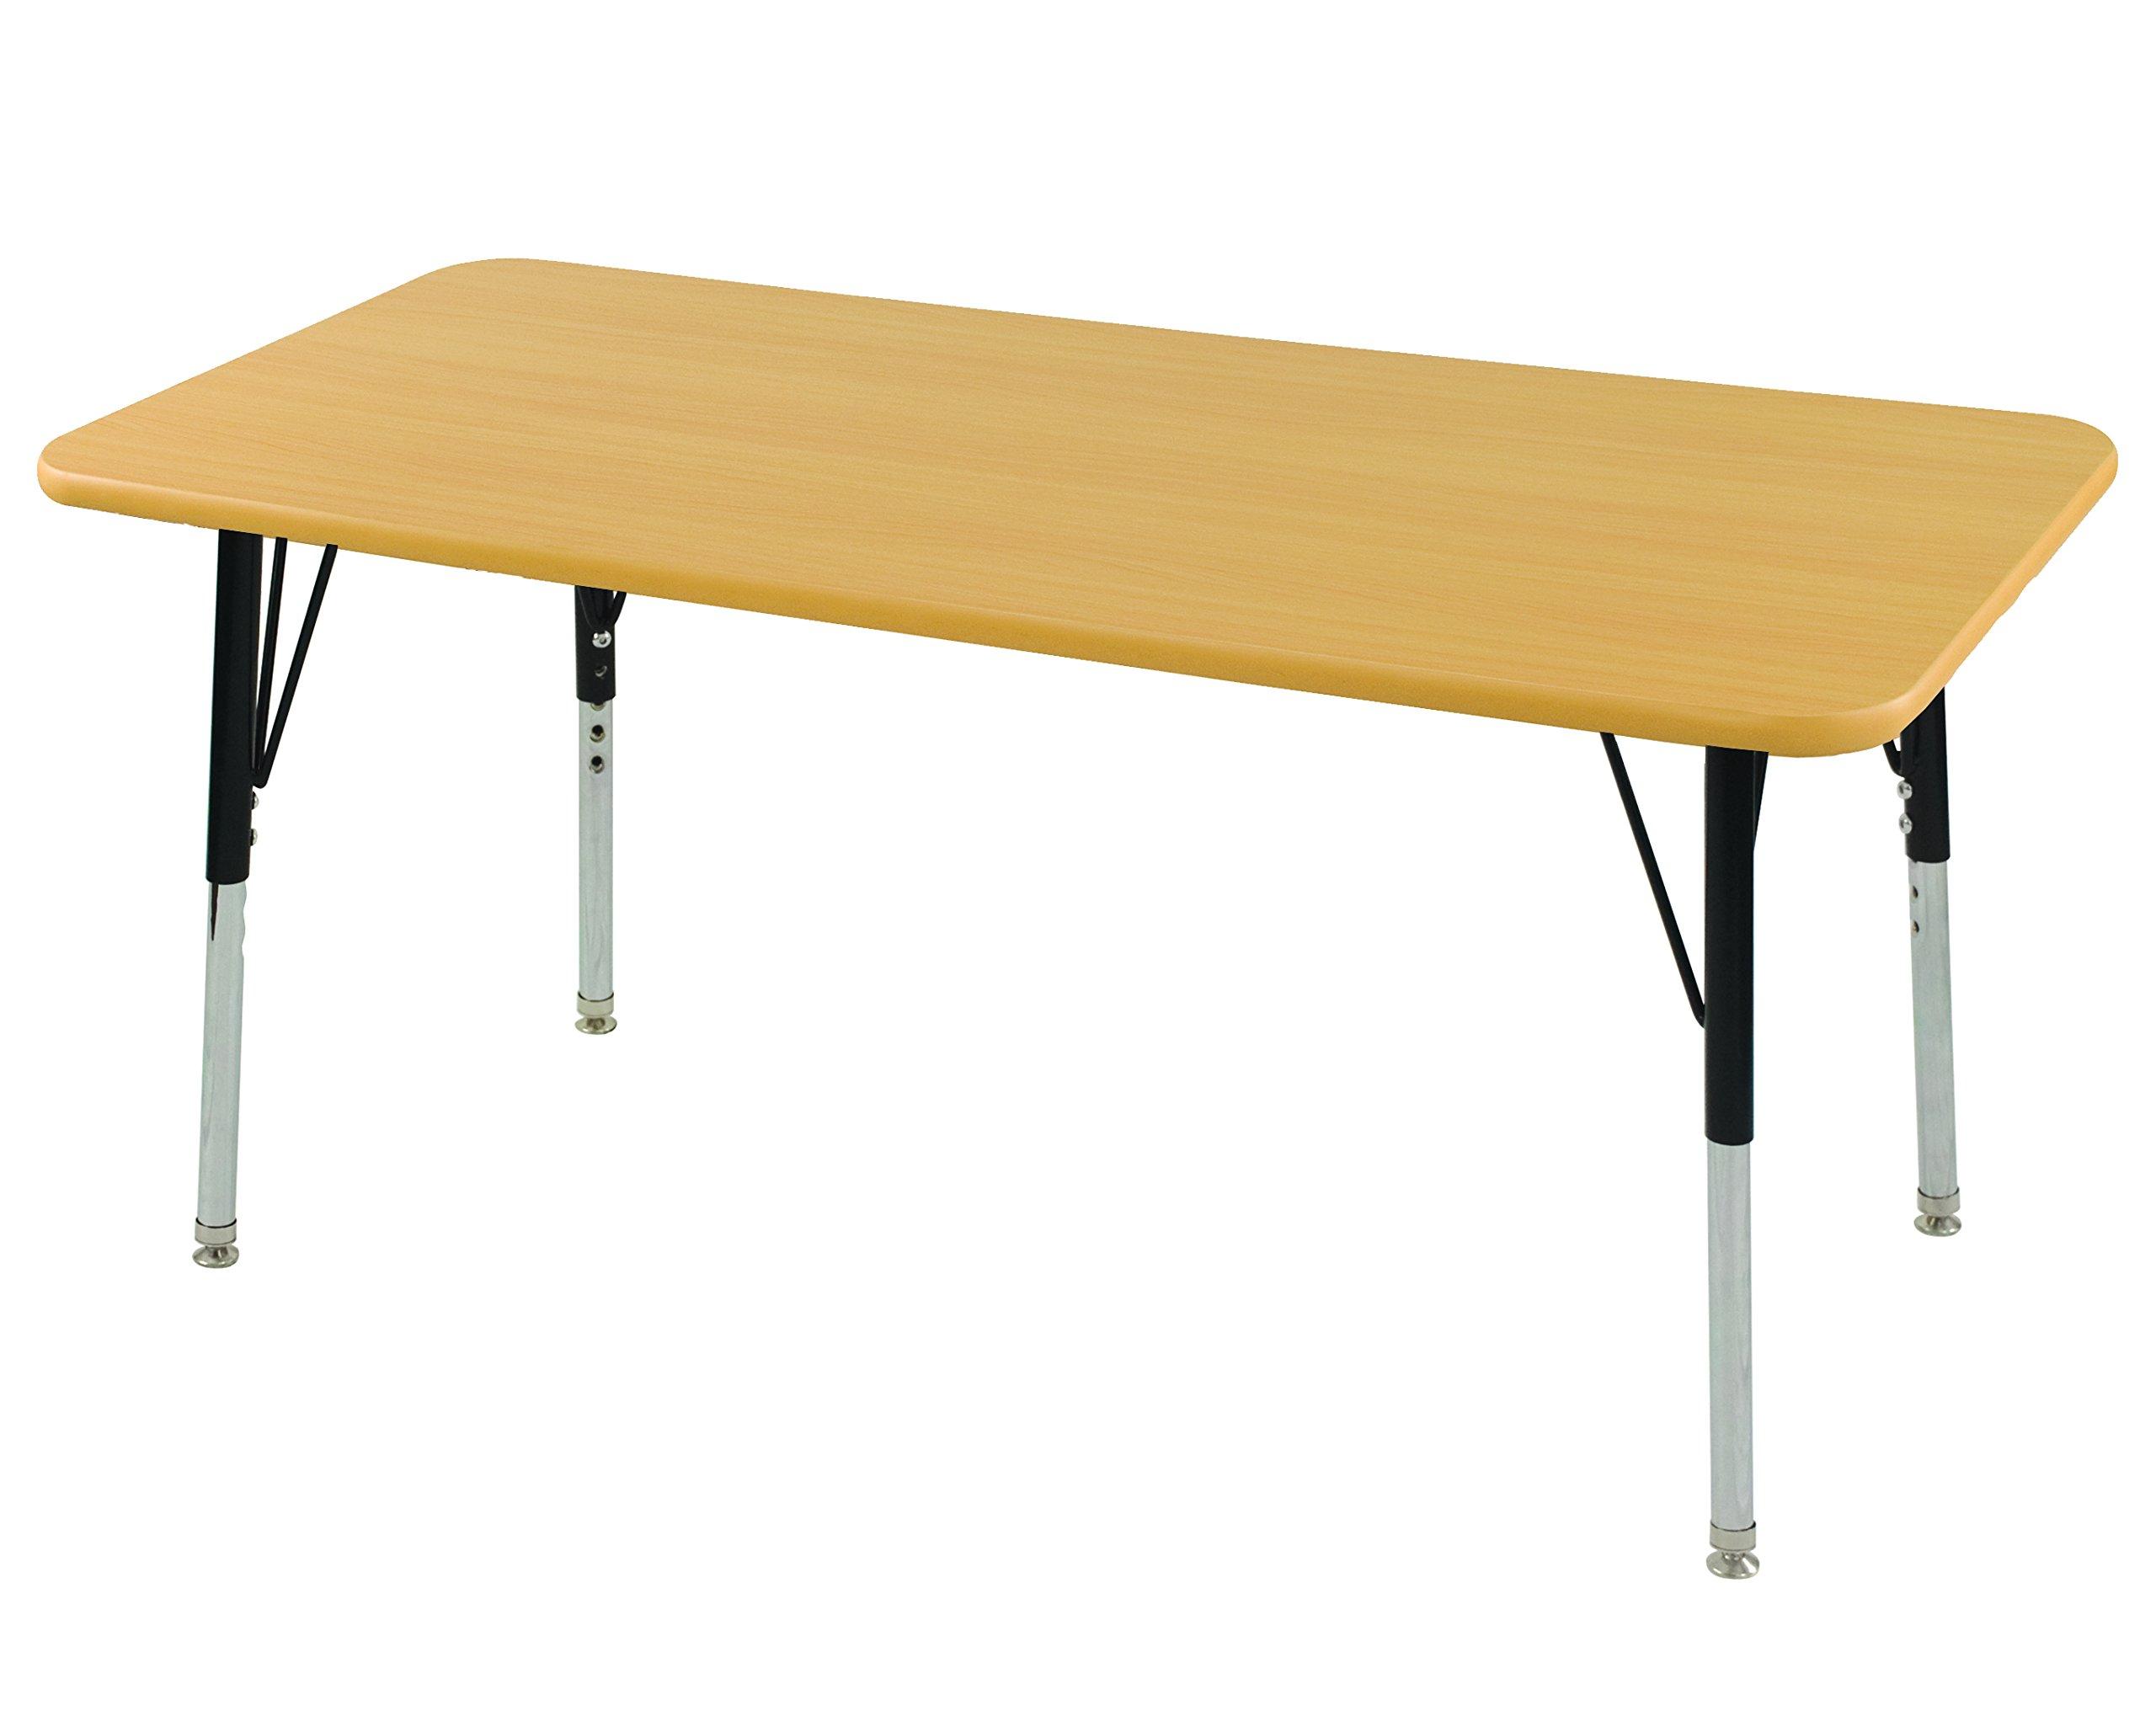 ECR4Kids Mesa T-Mold 30'' x 60'' Rectangular School Activity Table, Standard Legs w/ Swivel Glides, Adjustable Height 19-30 inch (Maple)